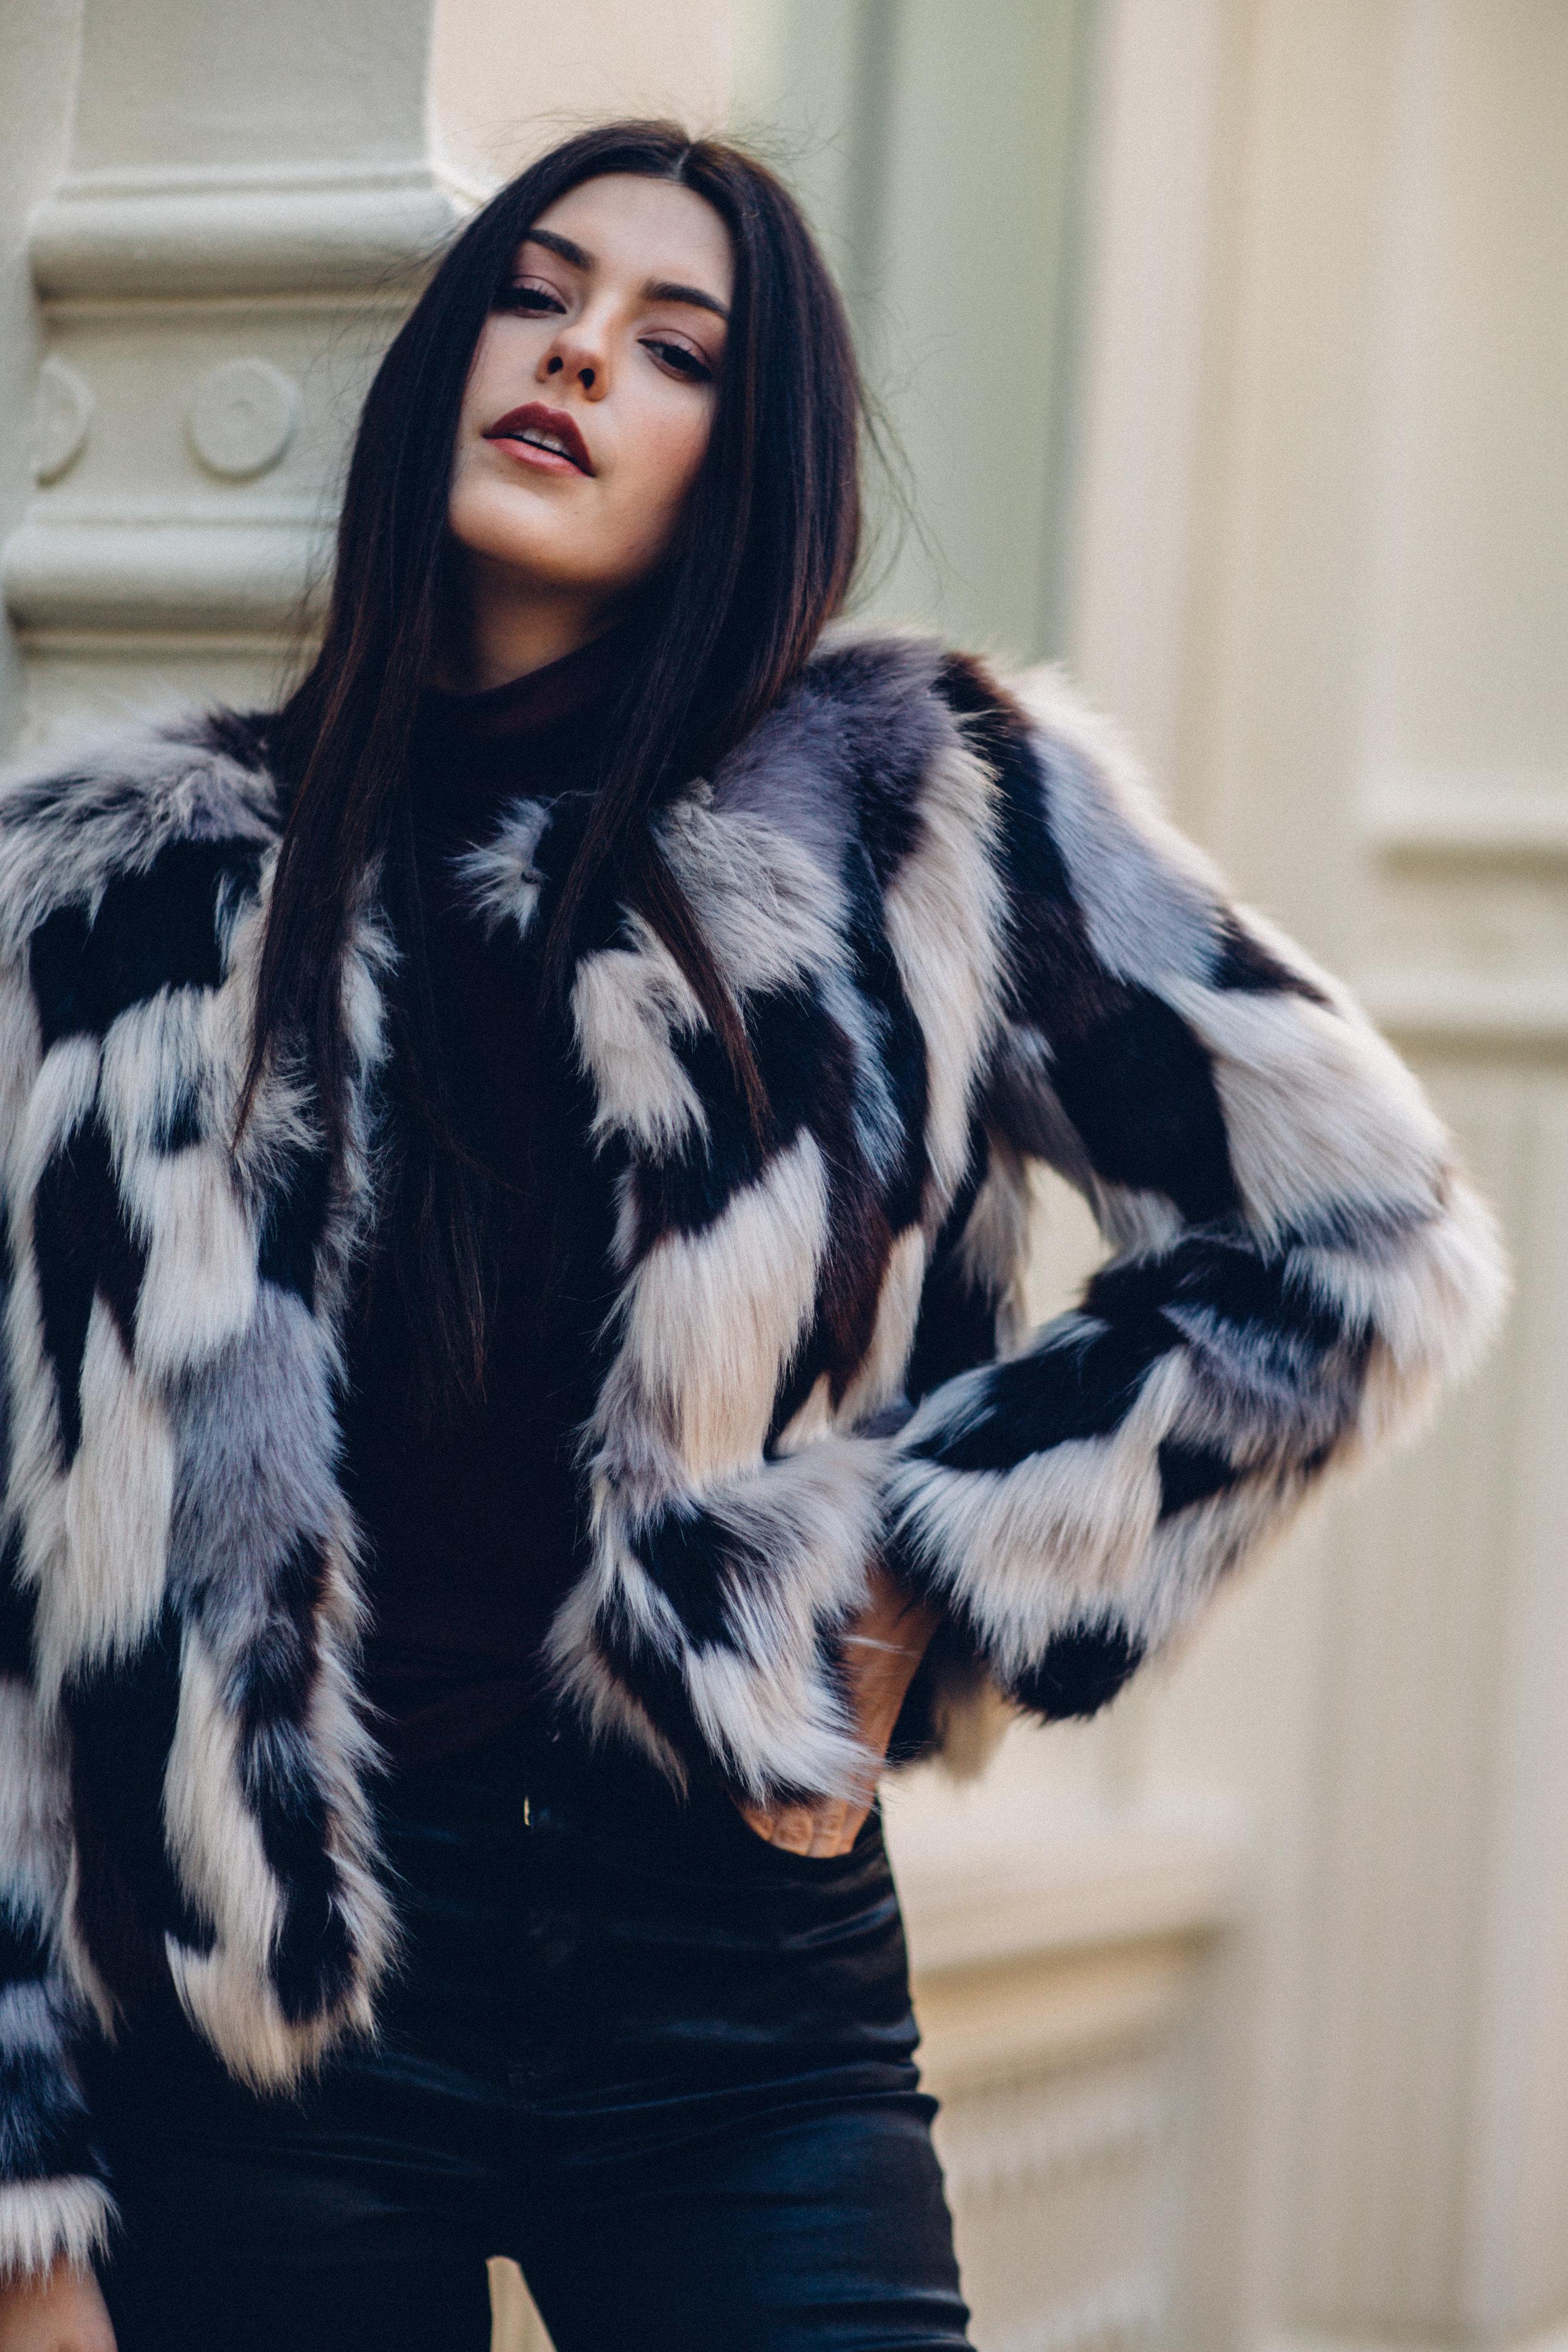 Julia Friedman New York Trip in December in a Forever 21 jacket.